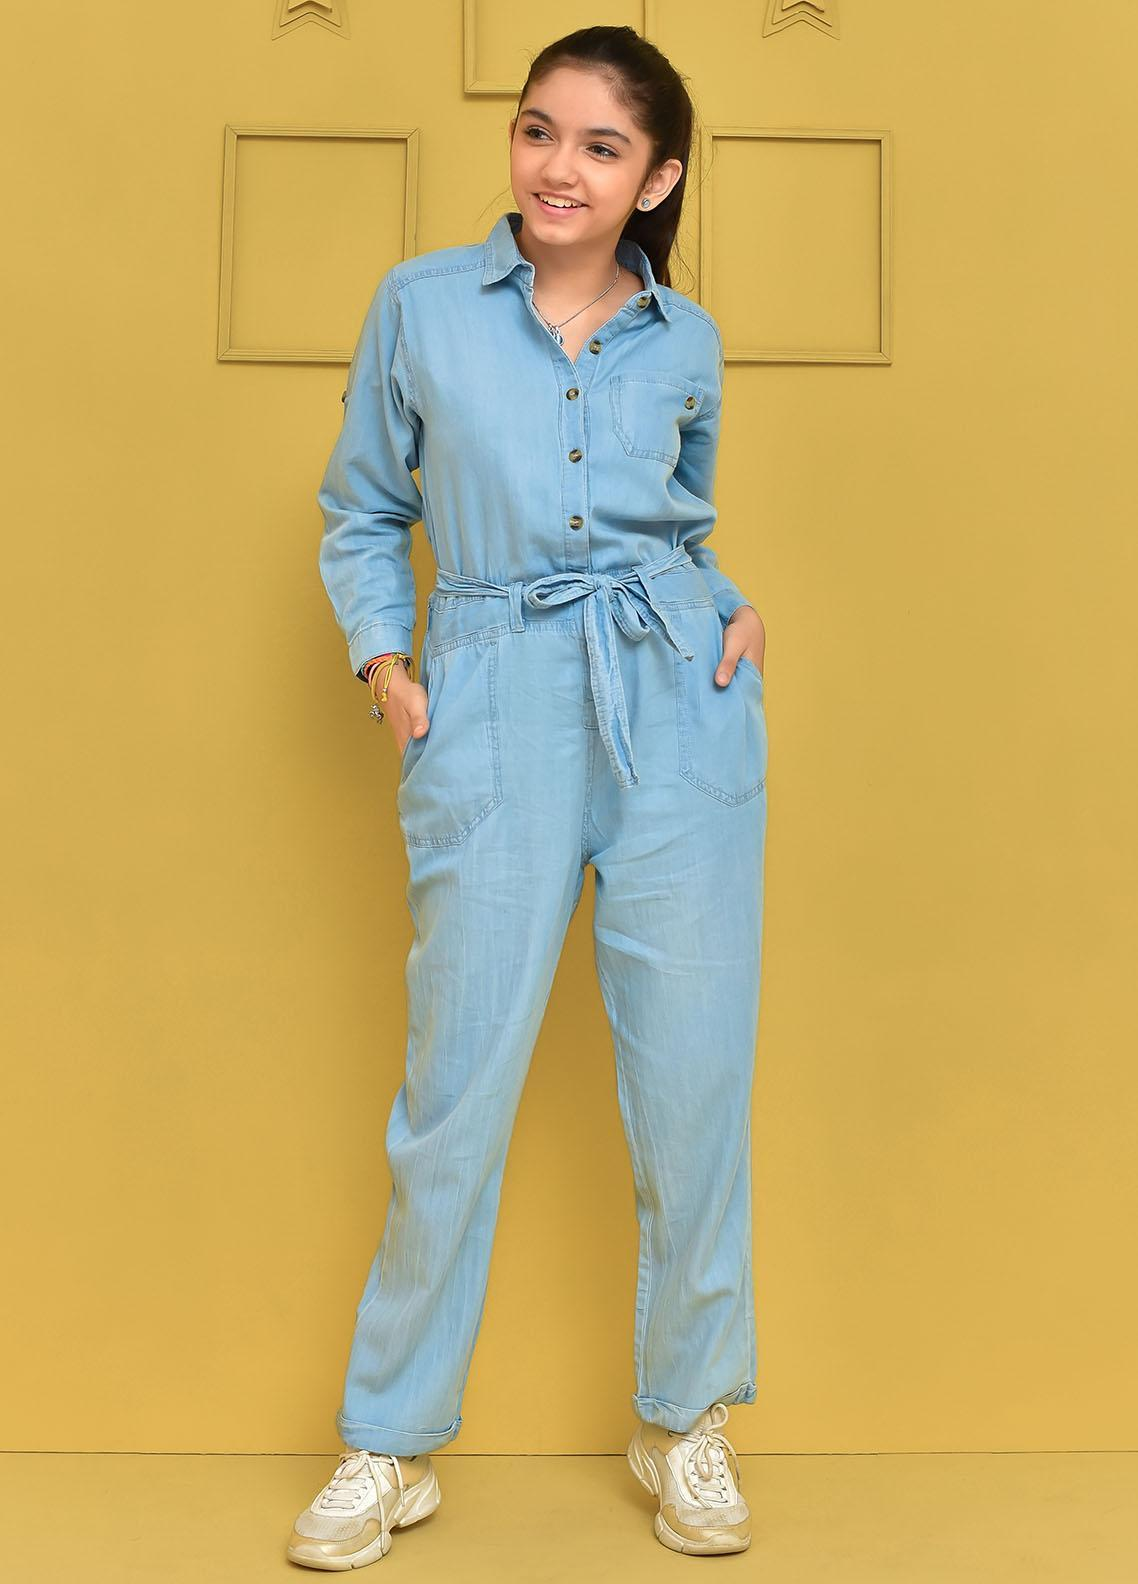 Ochre Cotton Western Jumpsuit for Girls -  OWT-455 Blue